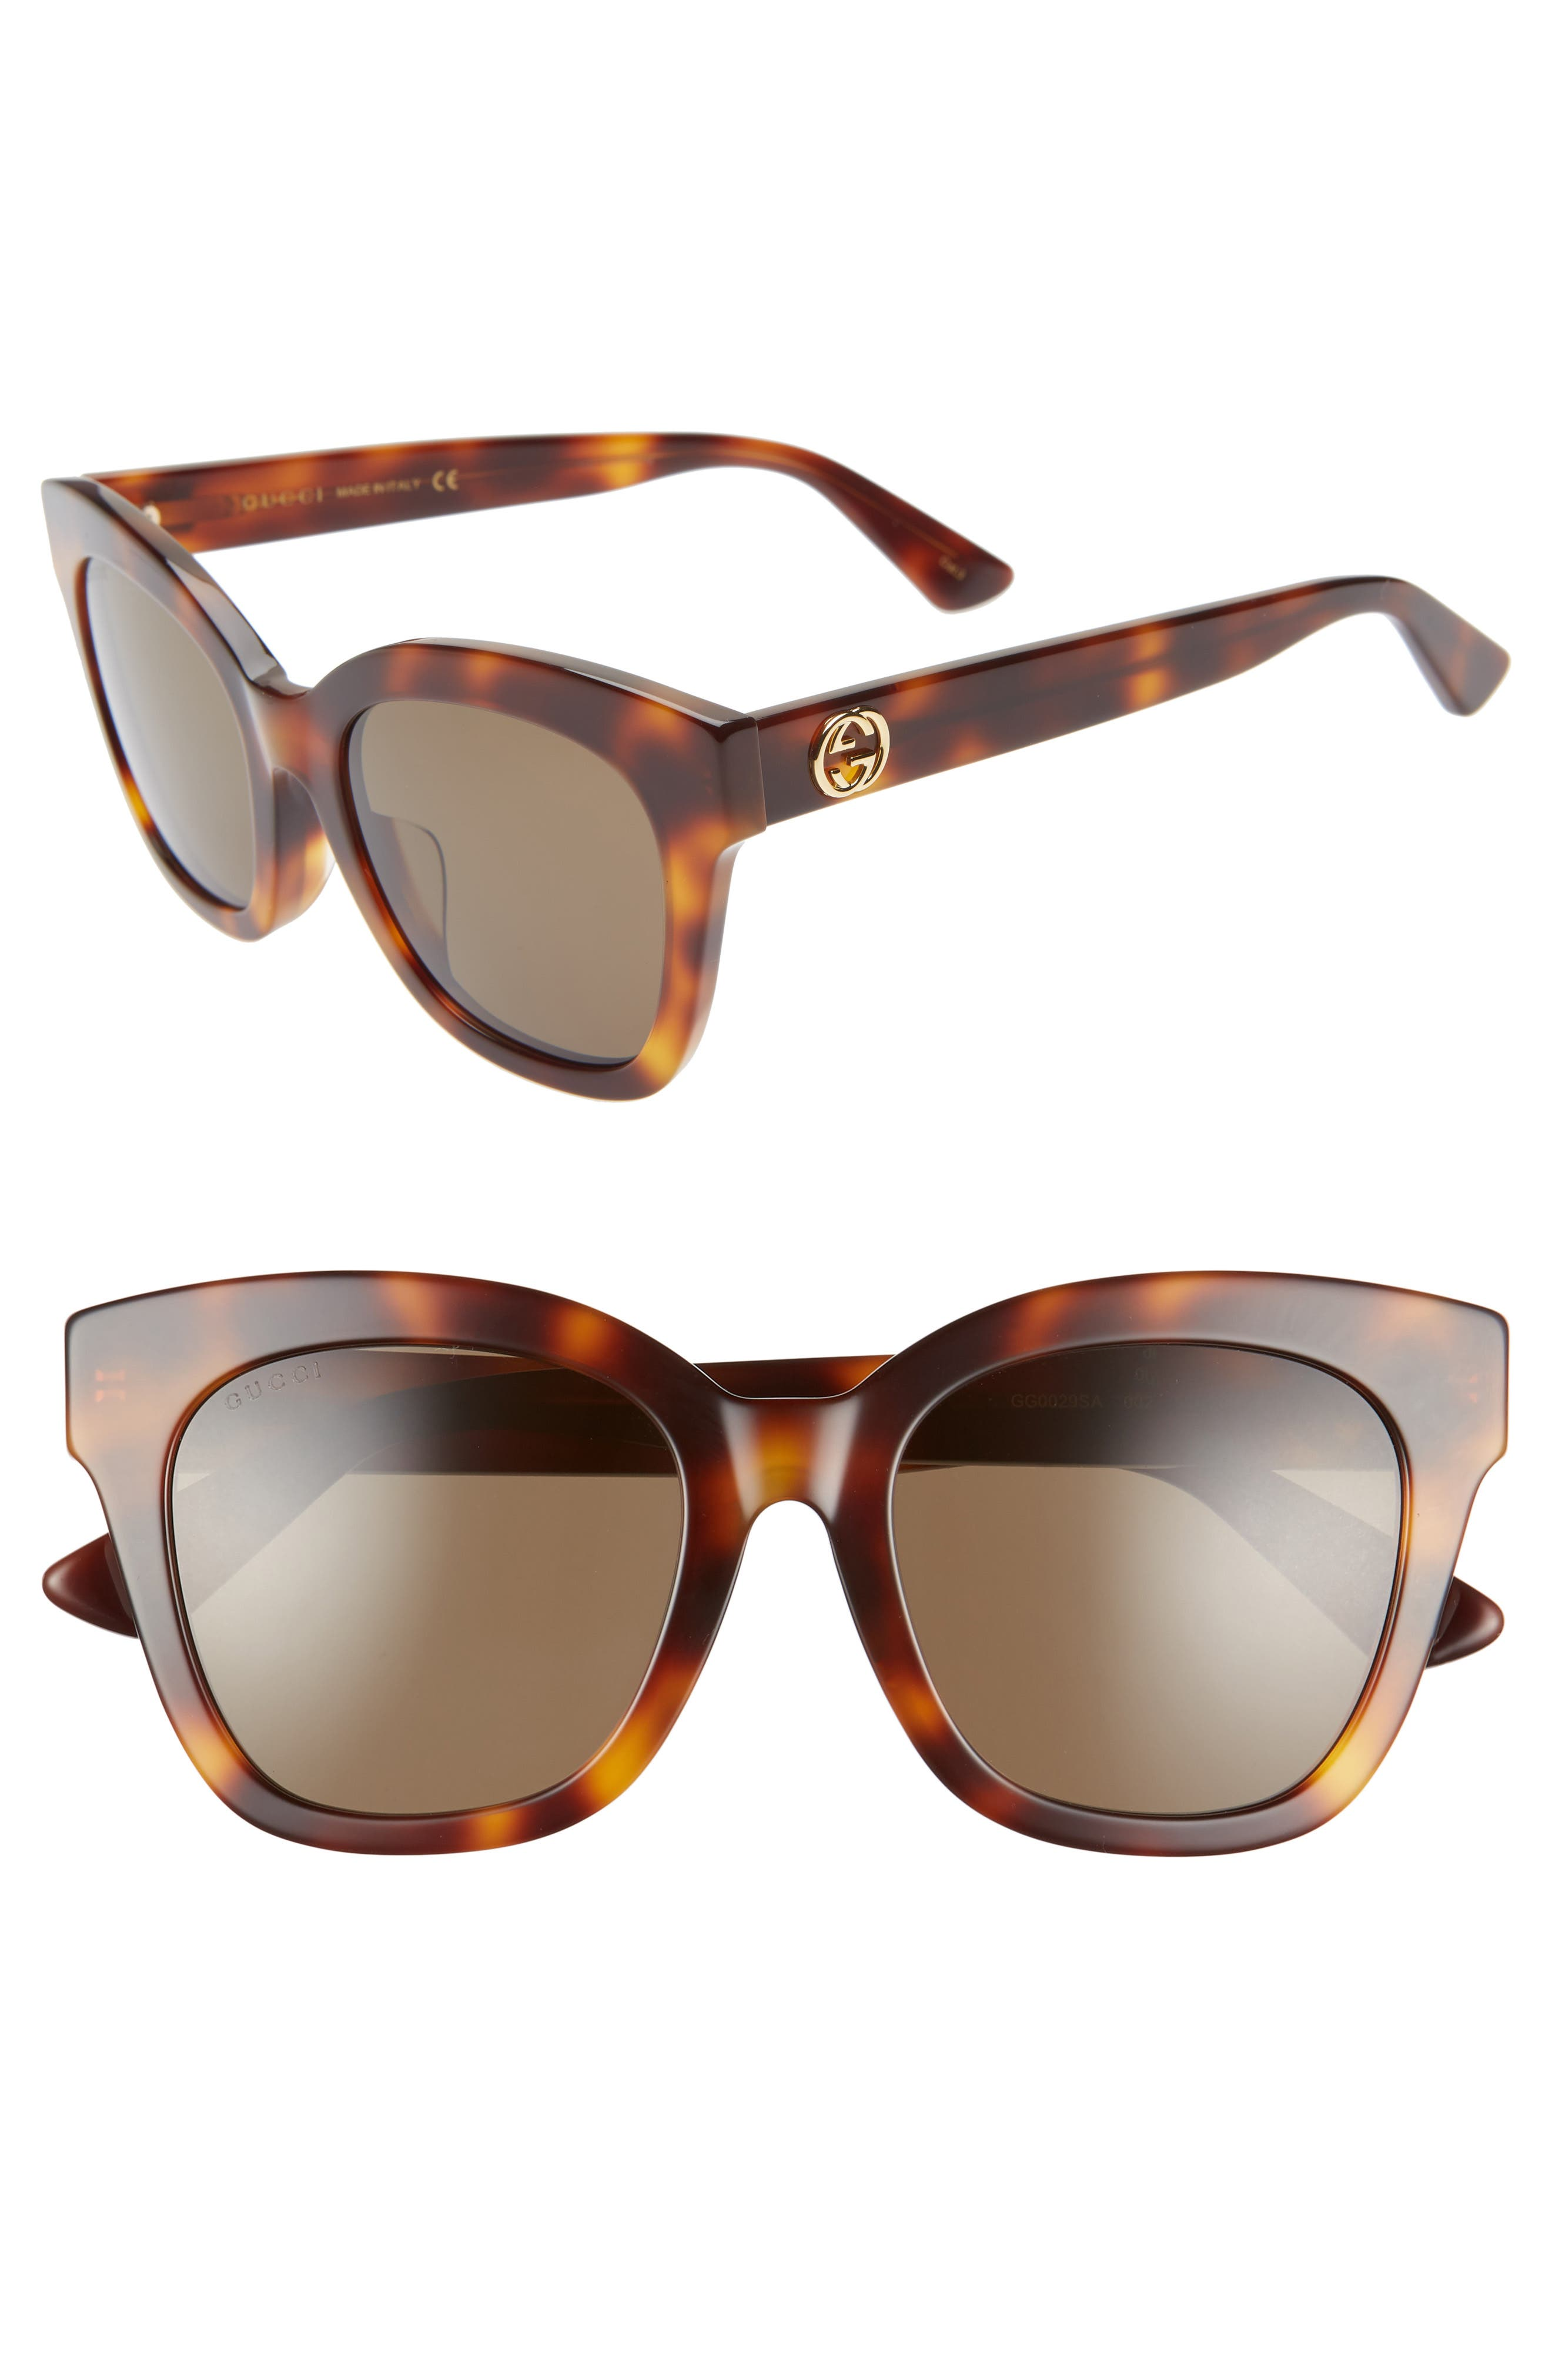 5f61d0cc07 Gucci Women s Sunglasses